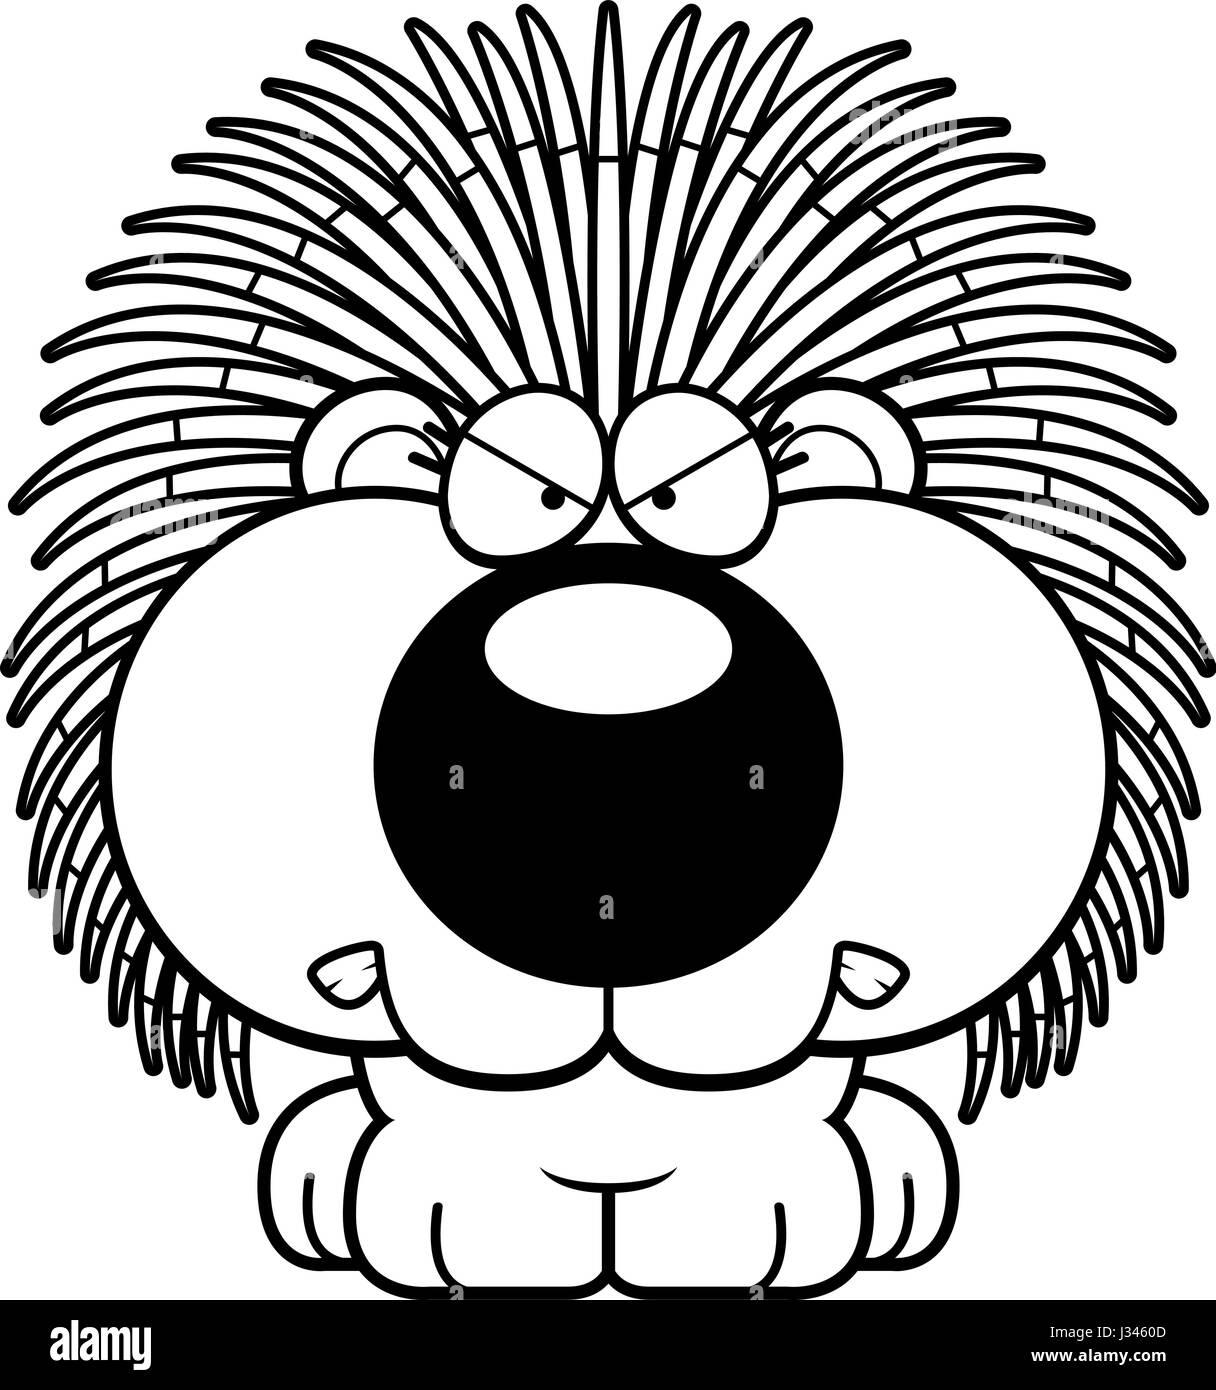 porcupine black and white stock photos u0026 images alamy